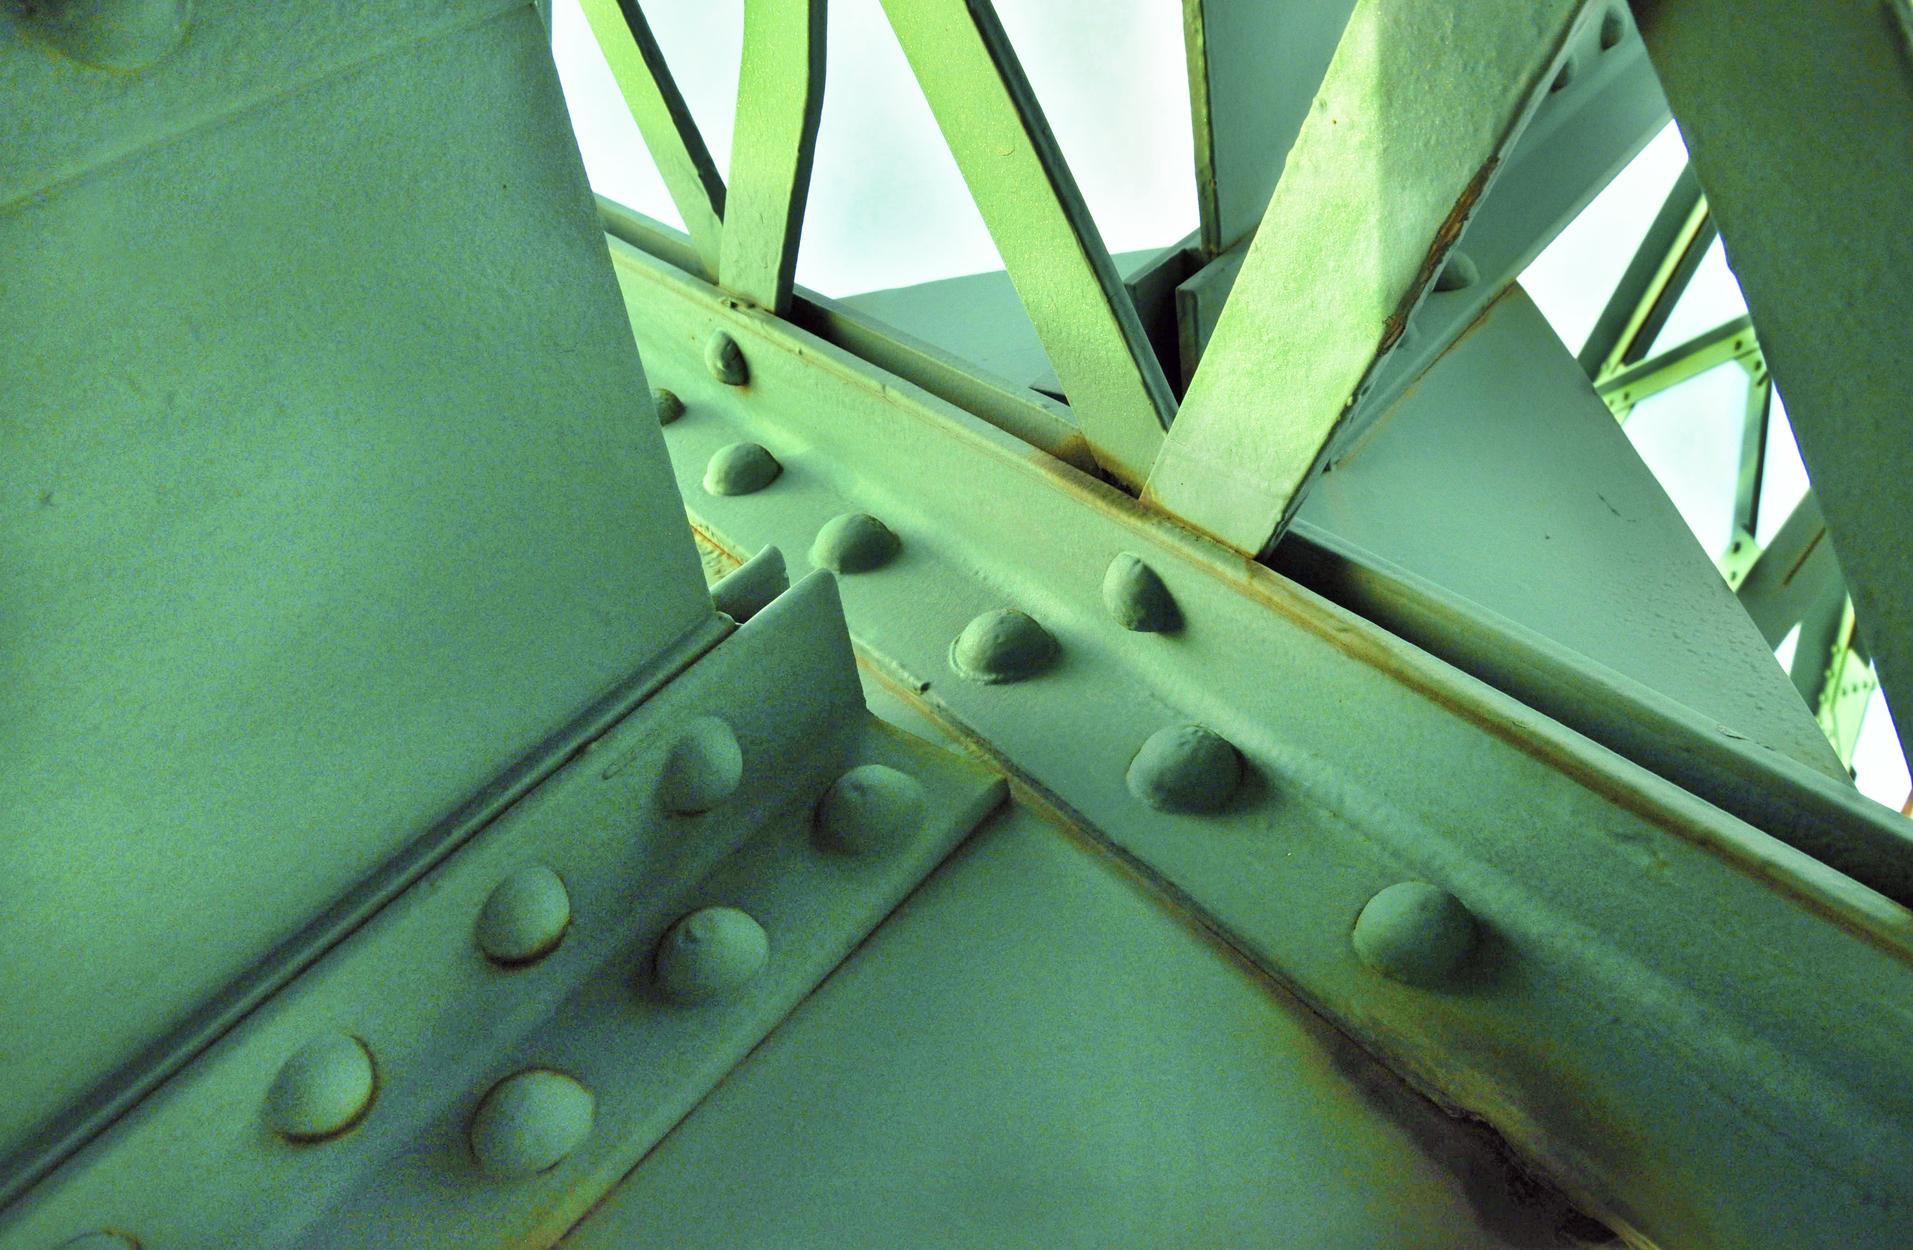 Angles Above Artwork by Leslie Jordan